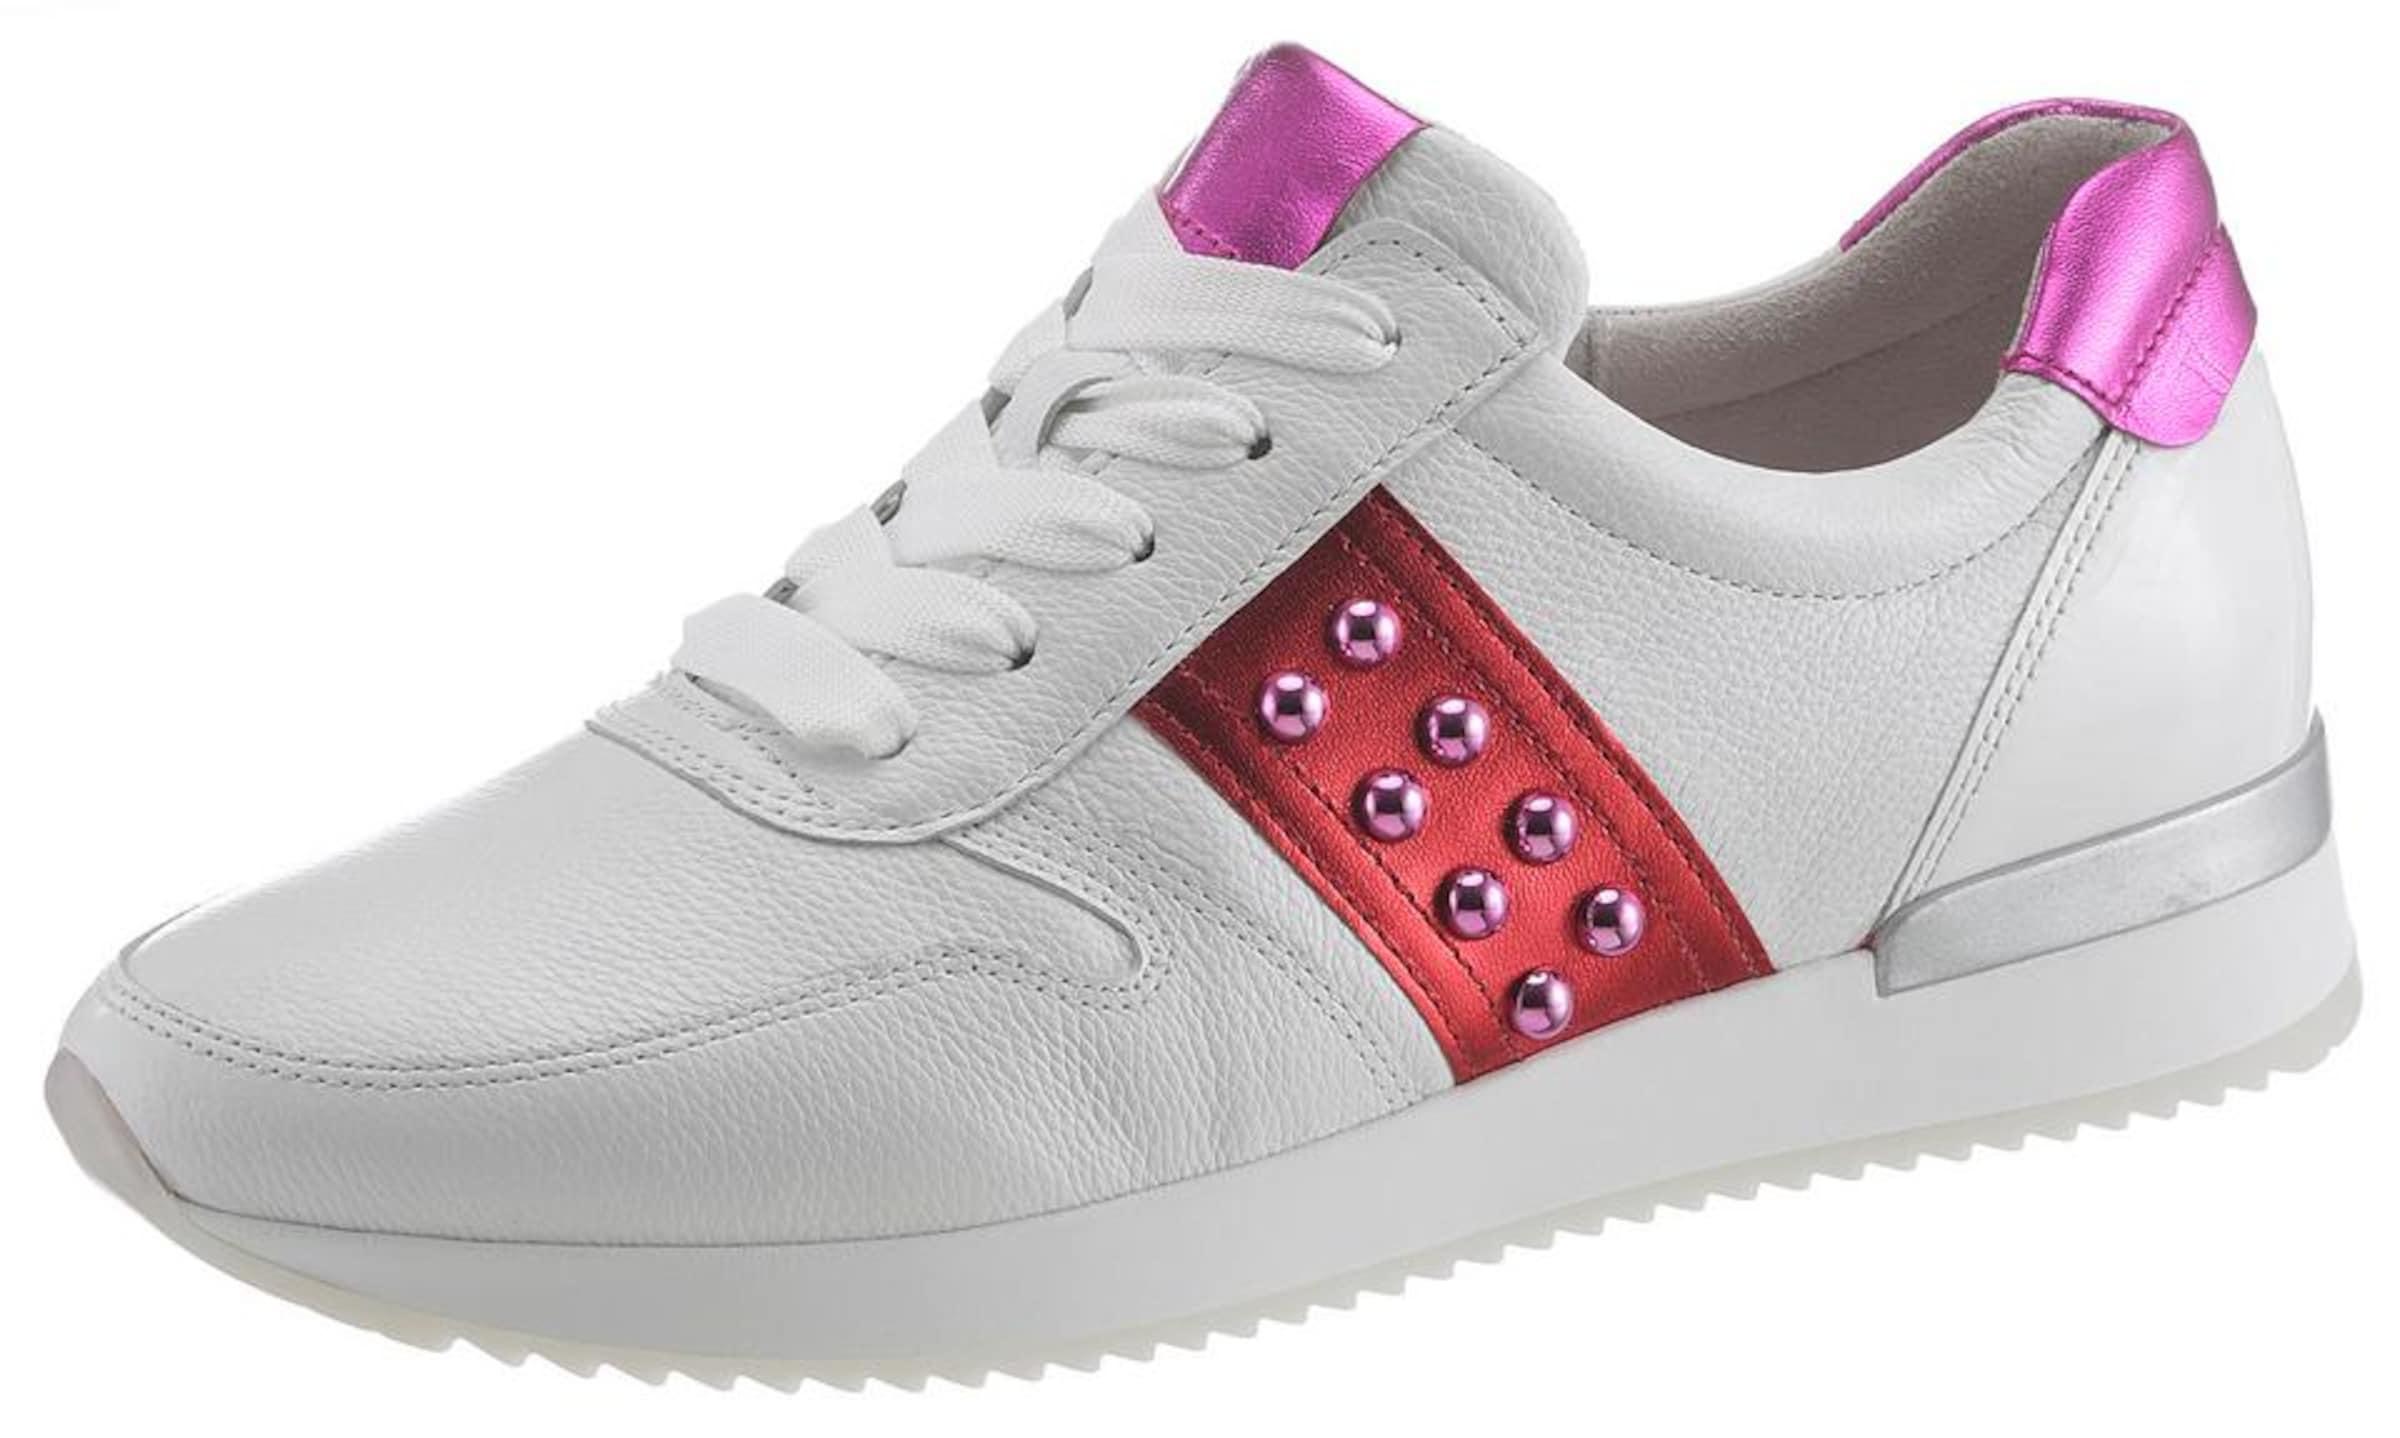 CyclamRot Gabor CyclamRot Sneaker Weiß In In Gabor In Weiß Sneaker CyclamRot Sneaker Gabor qVUMpzSG